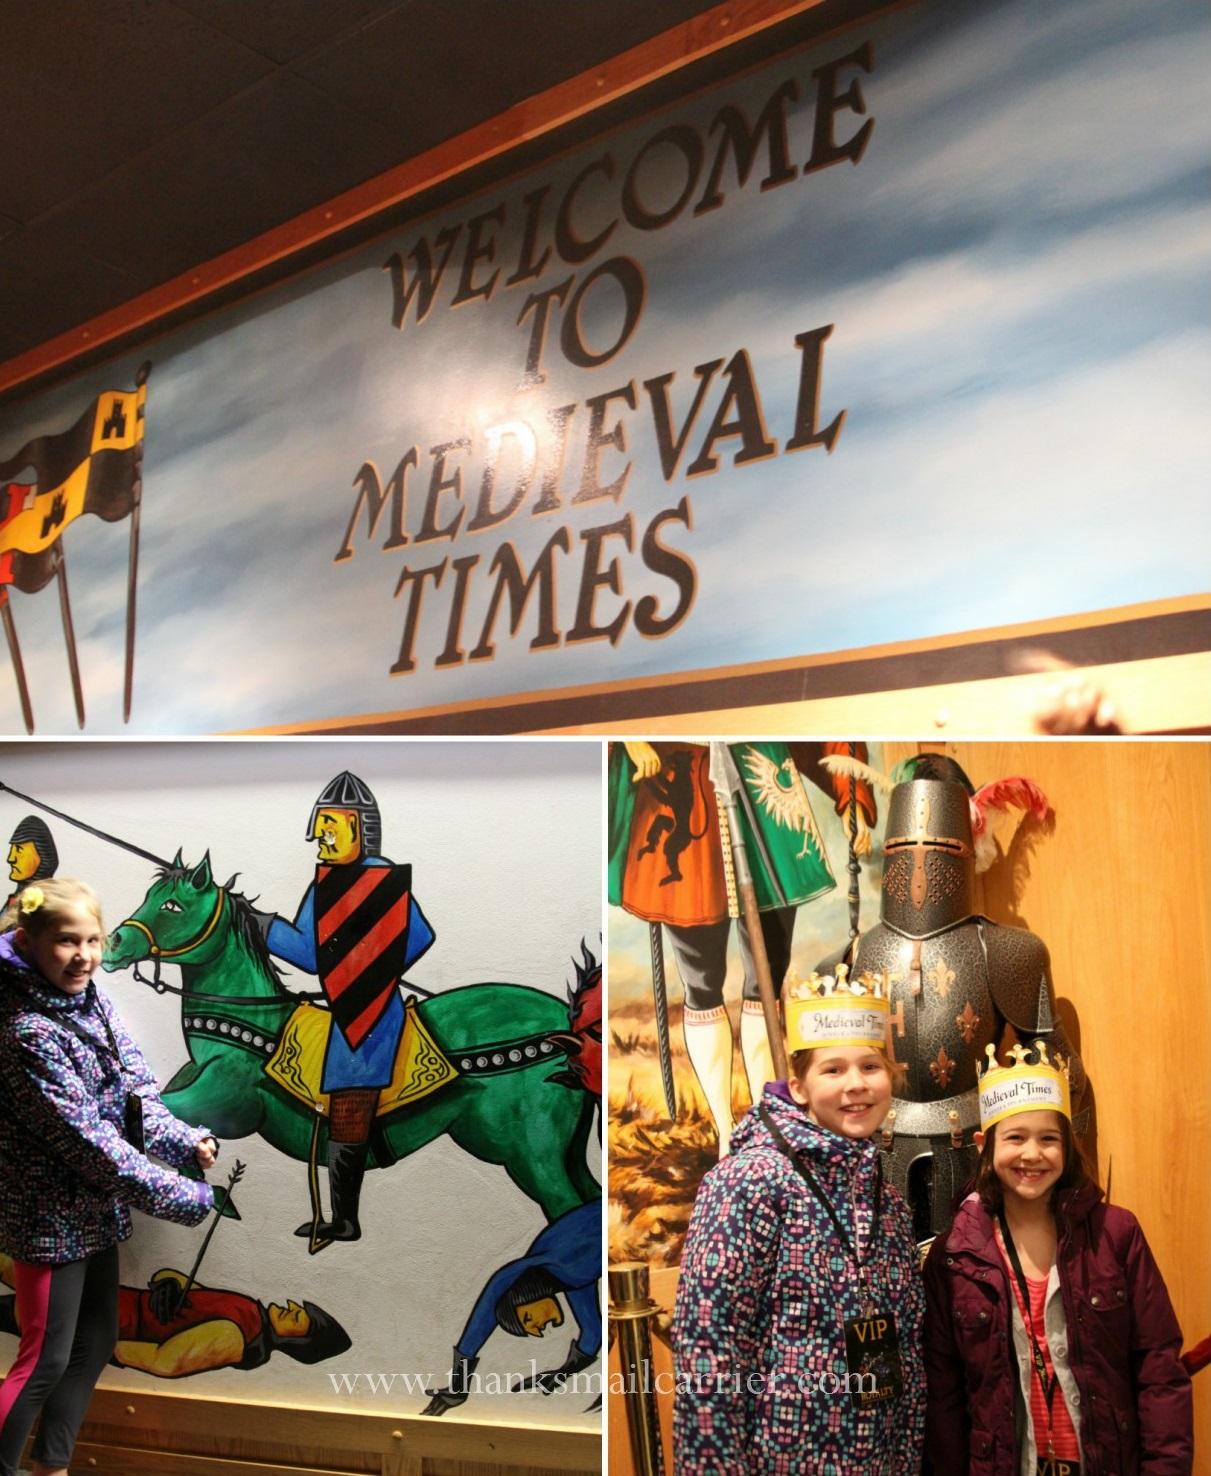 Medieval Times visit